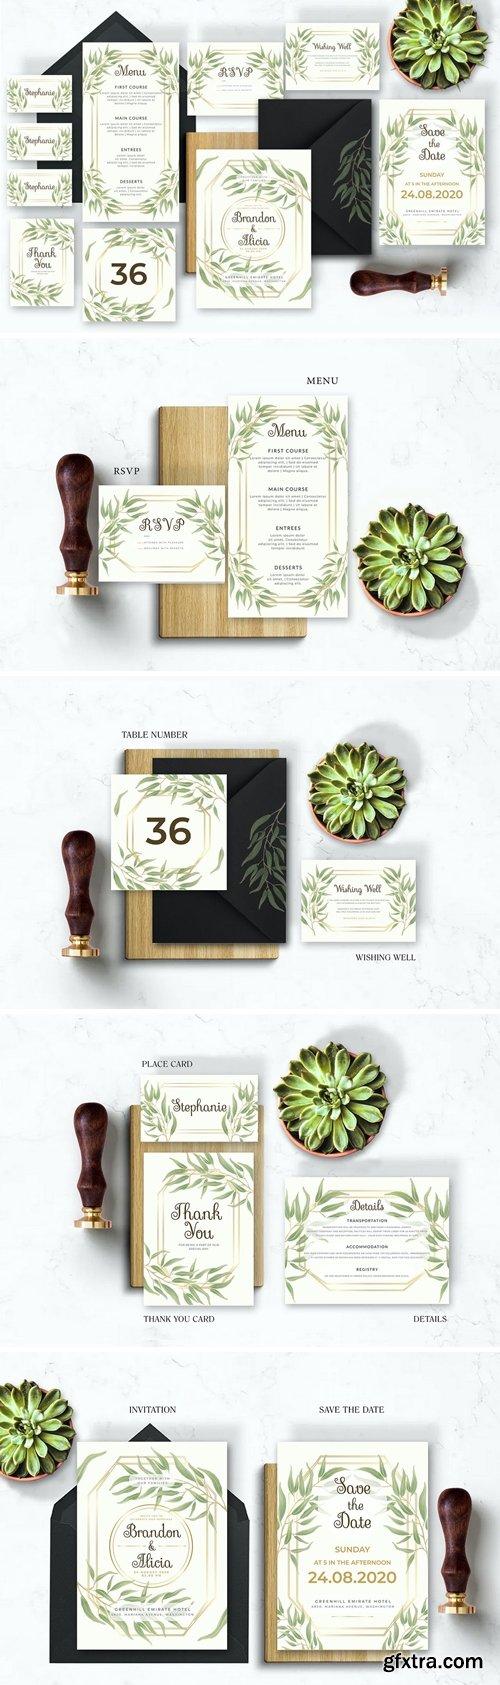 Light Floral - Wedding Invitation